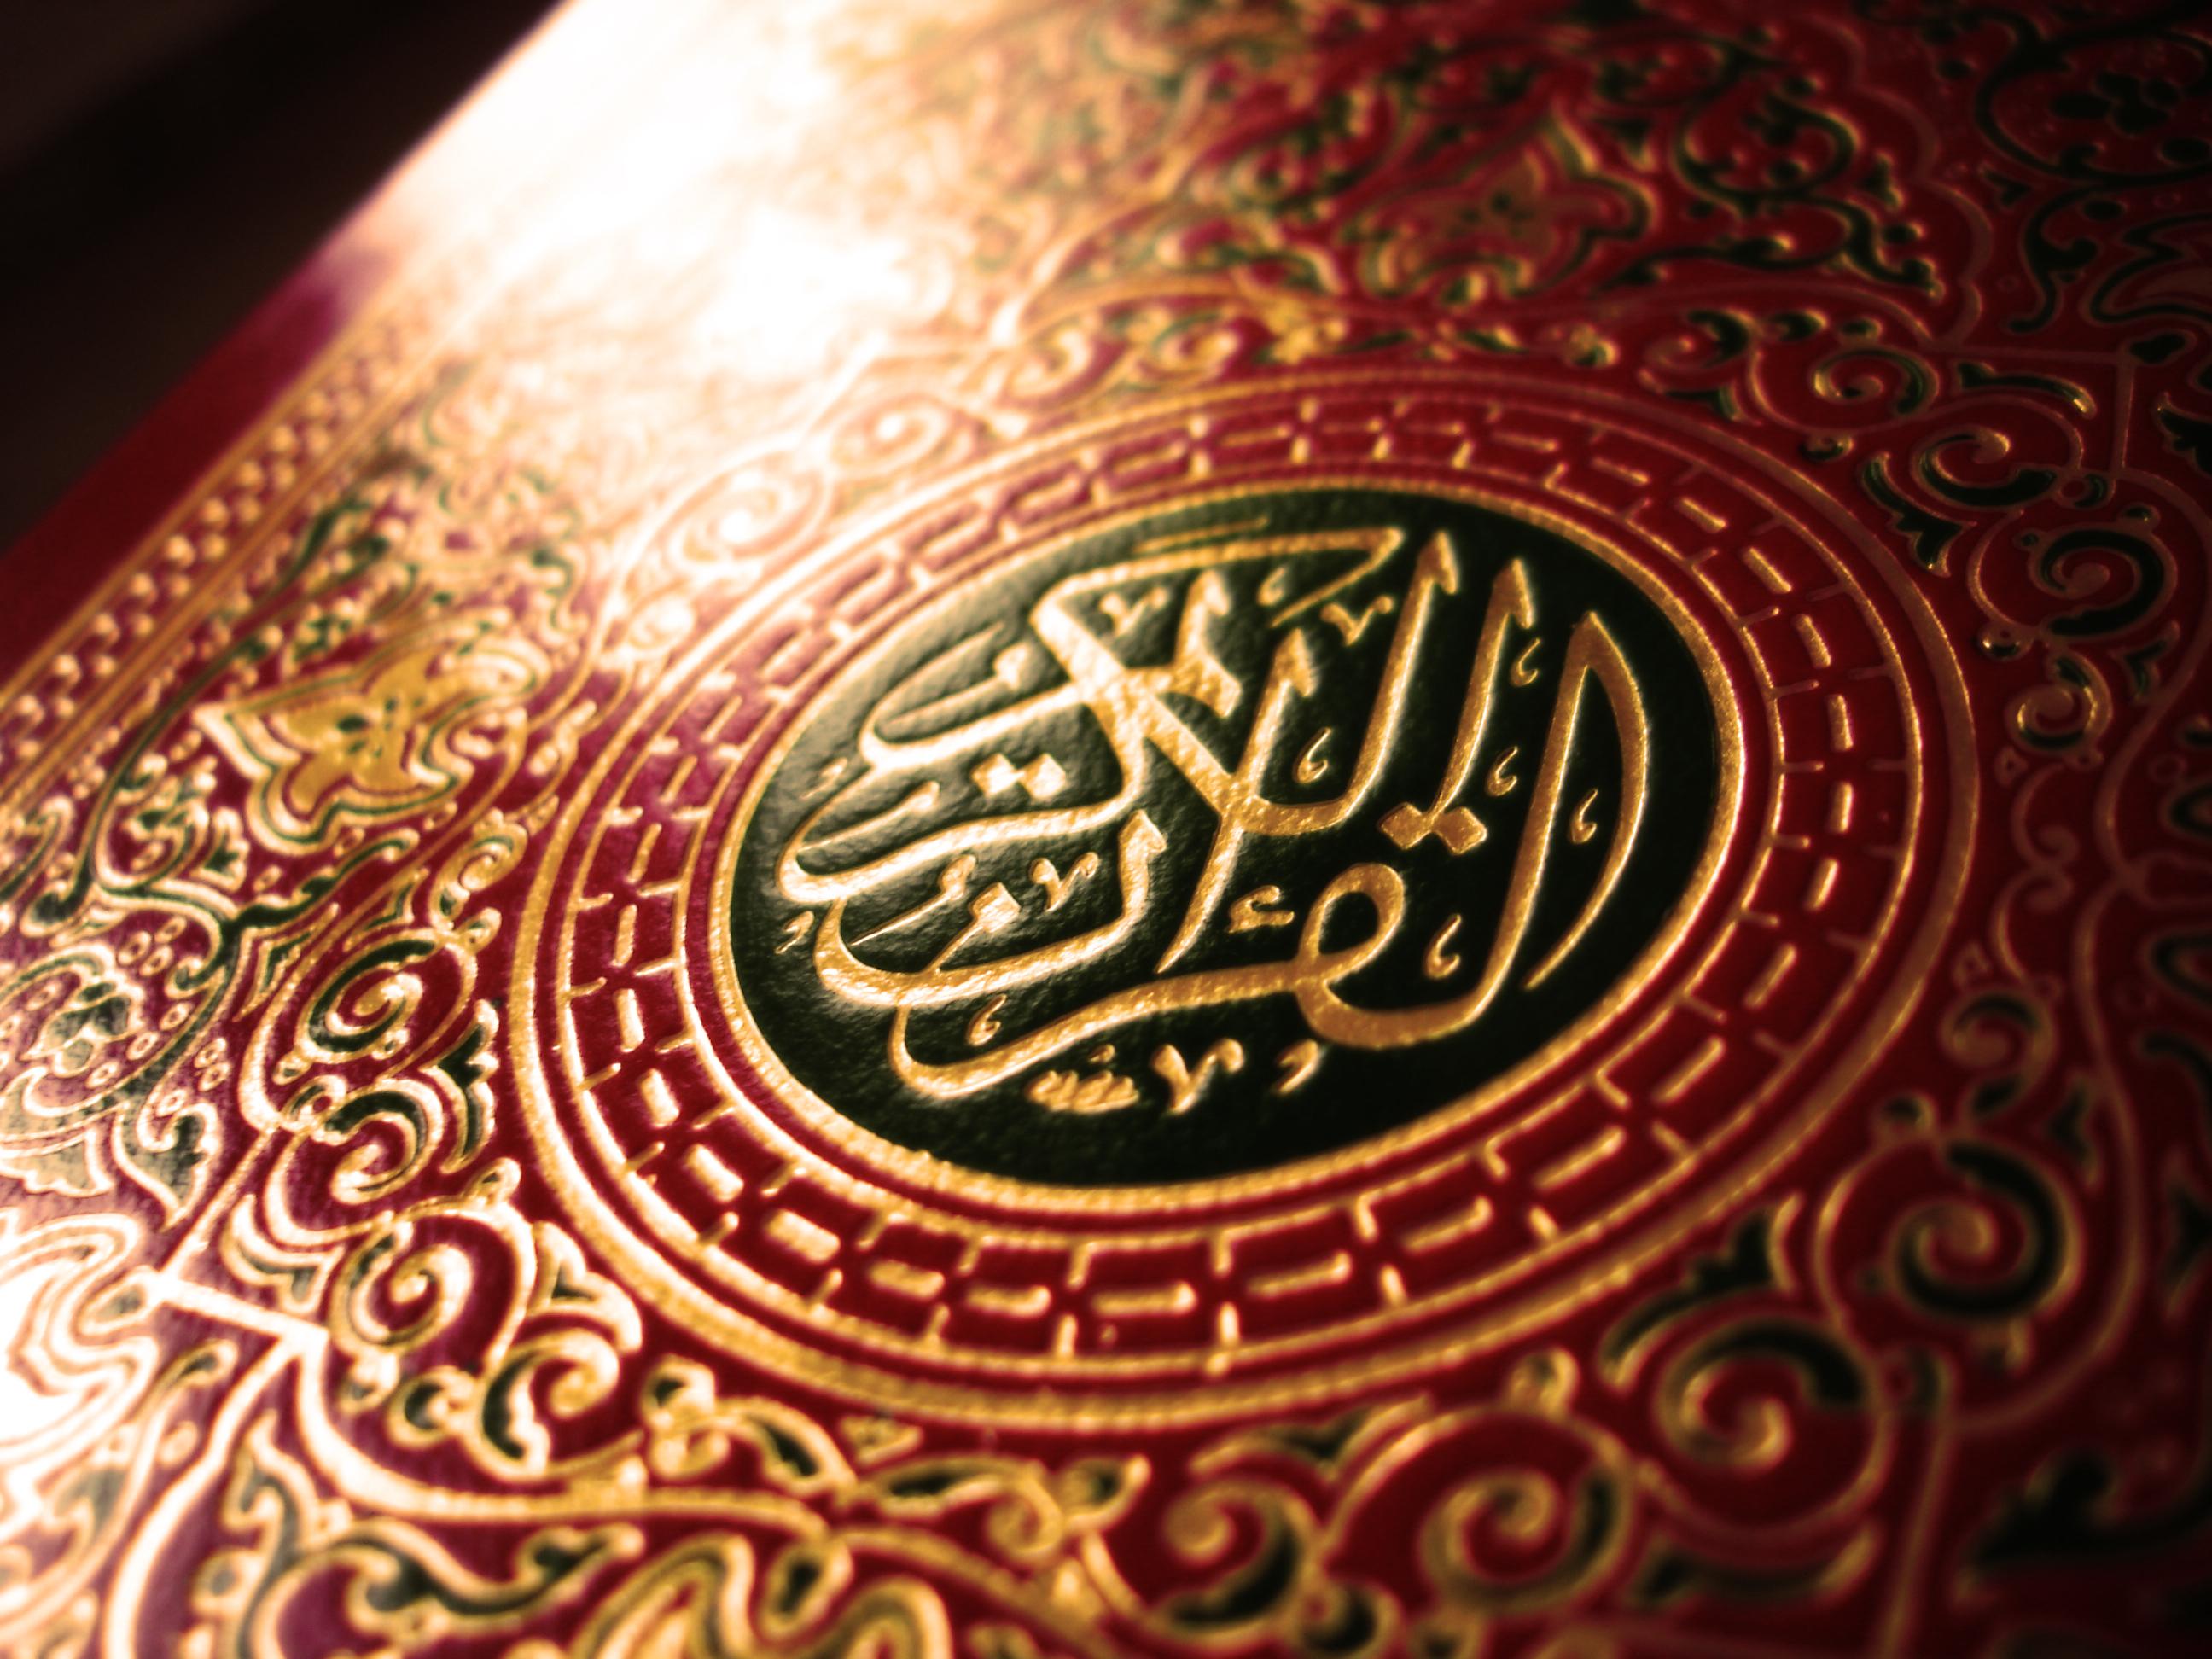 Sheikh Ash-Shuraim and As-Sudais recite from Surat Ash-Sharh verse no. 1 to Surat Al-`Adiyat verse no. 8.